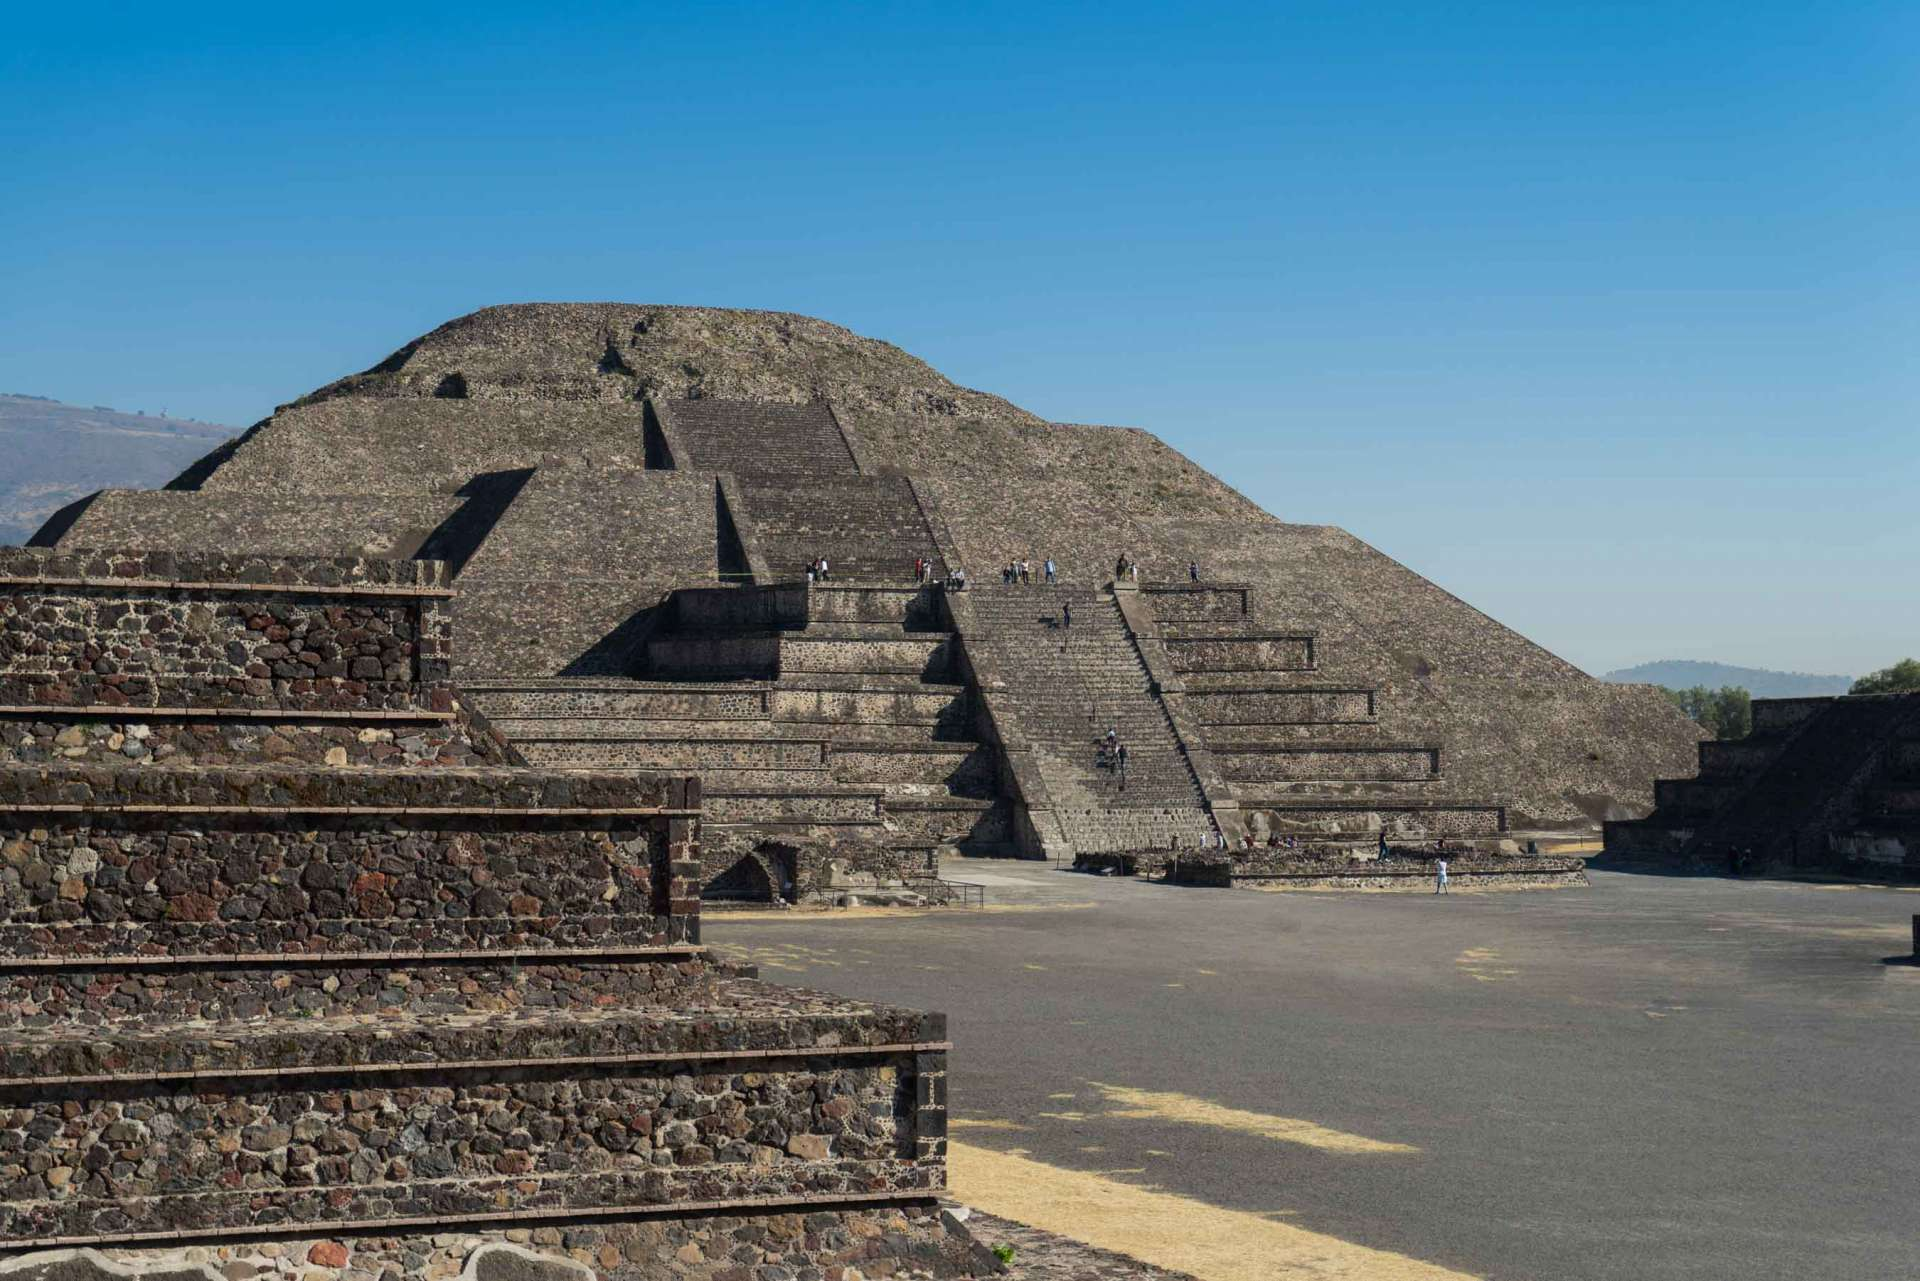 Teotihuacan Pyramids Mexico City Enrico Pescantini photographer 5